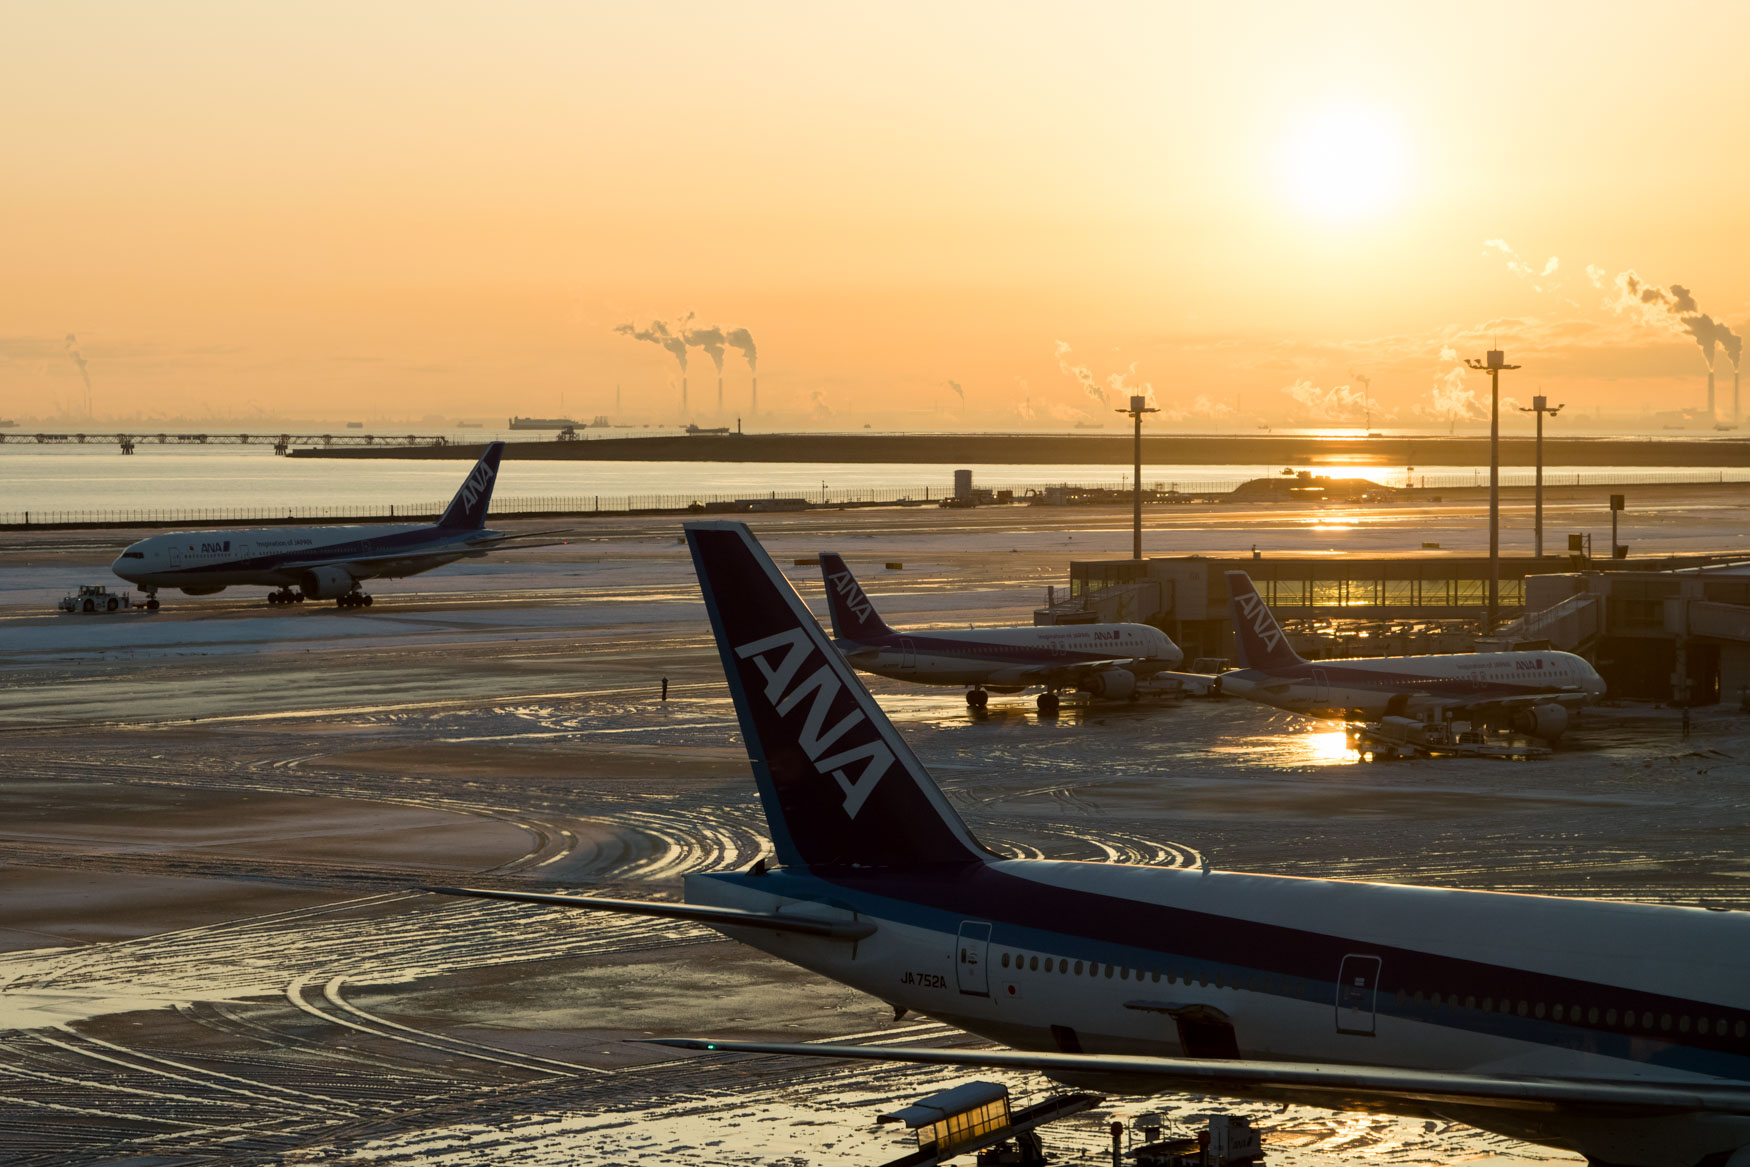 Sunrise at Snowy Haneda Airport